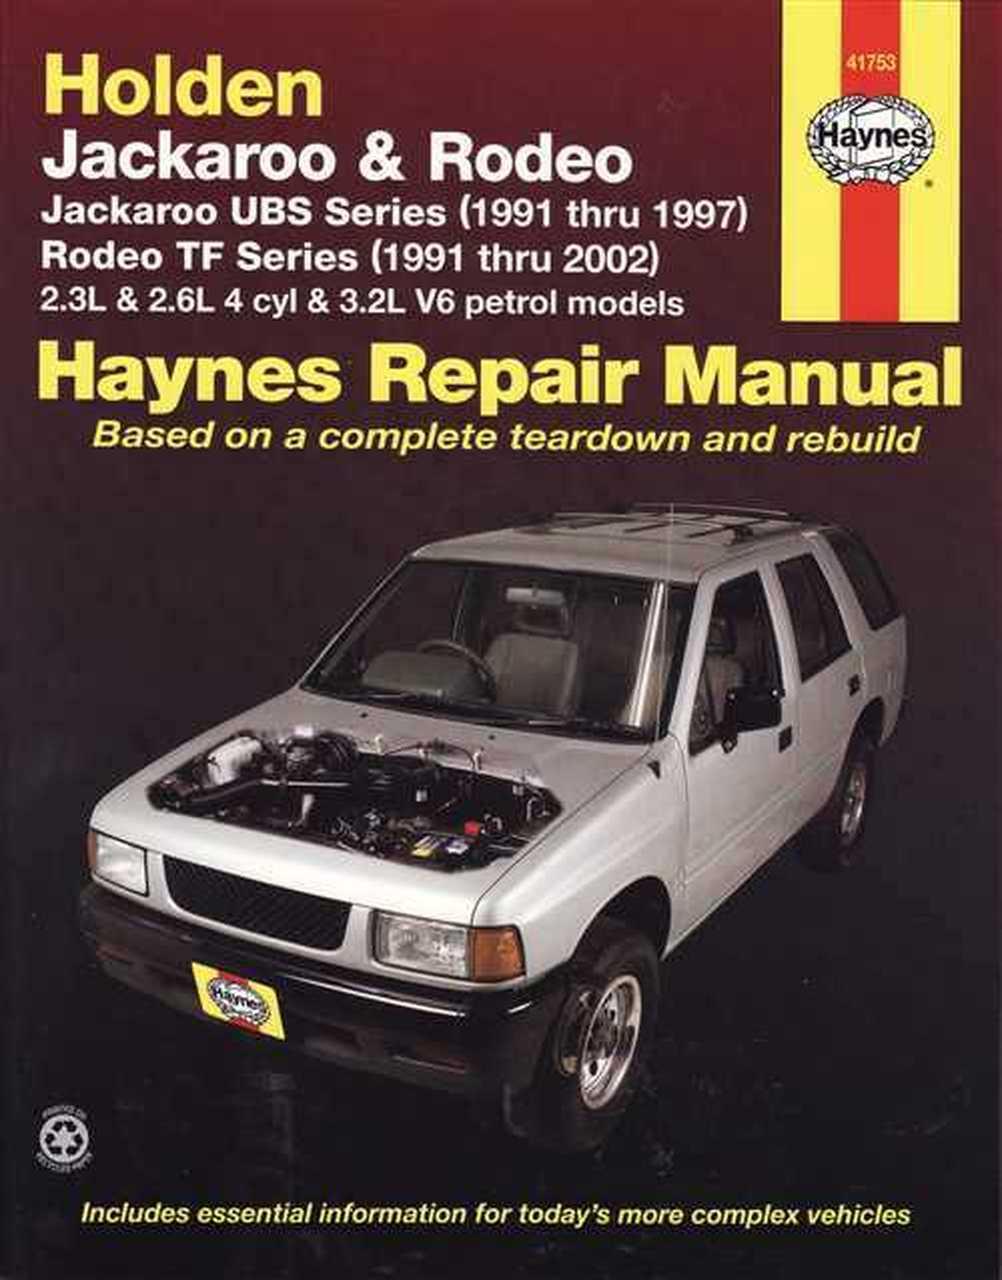 Holden Jackaroo 1991 1997 Rodeo 1991 2002 Haynes Service Repair Manual Instruction Manual